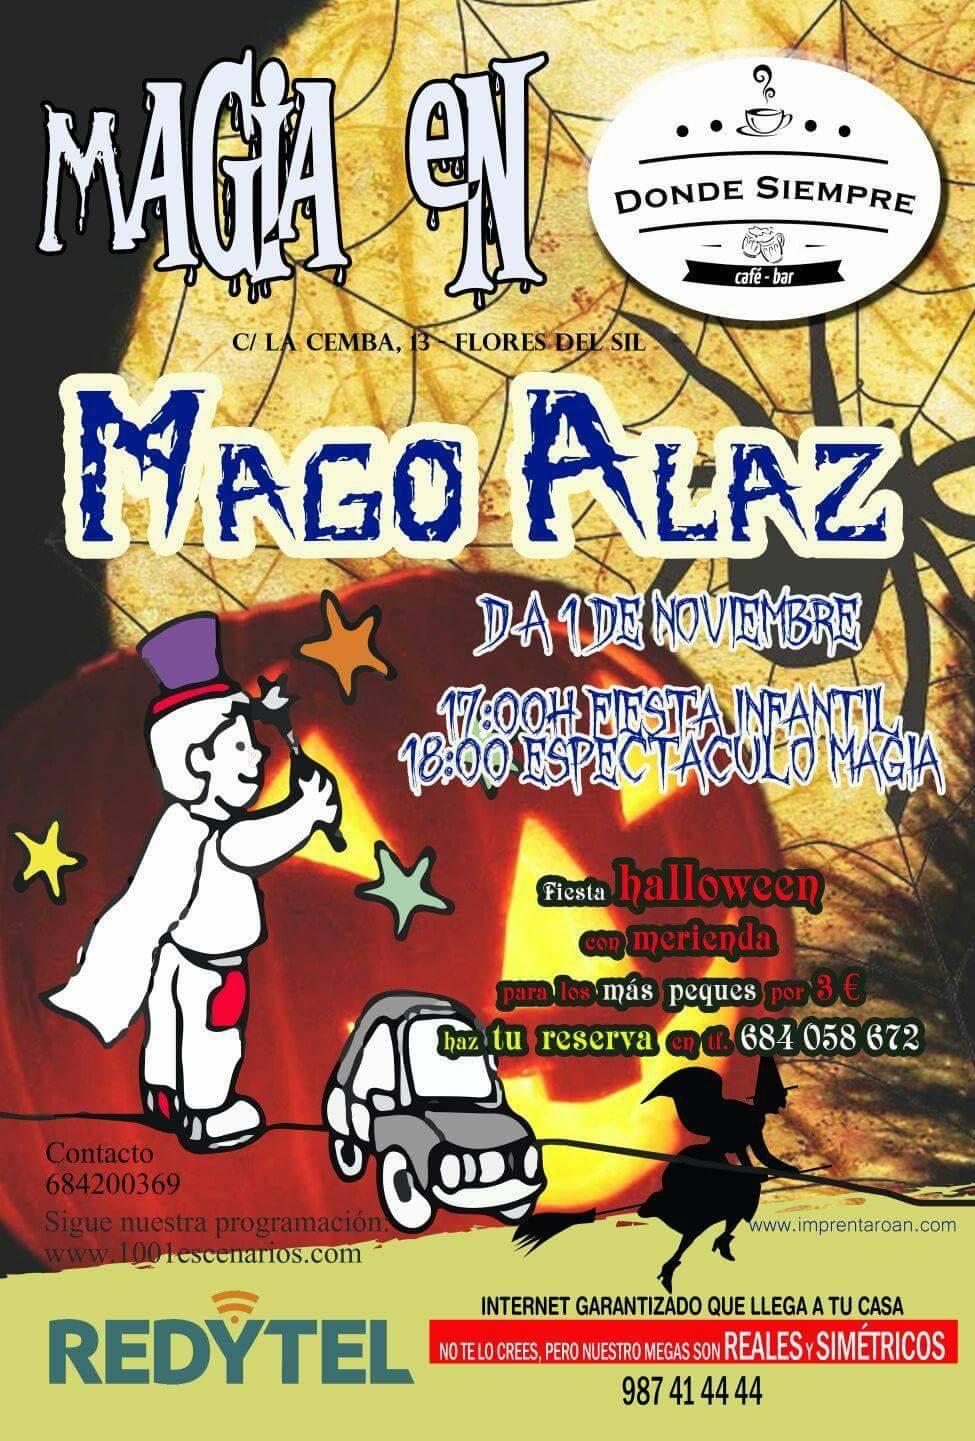 Fiesta infantil de Hallowen con magia 1